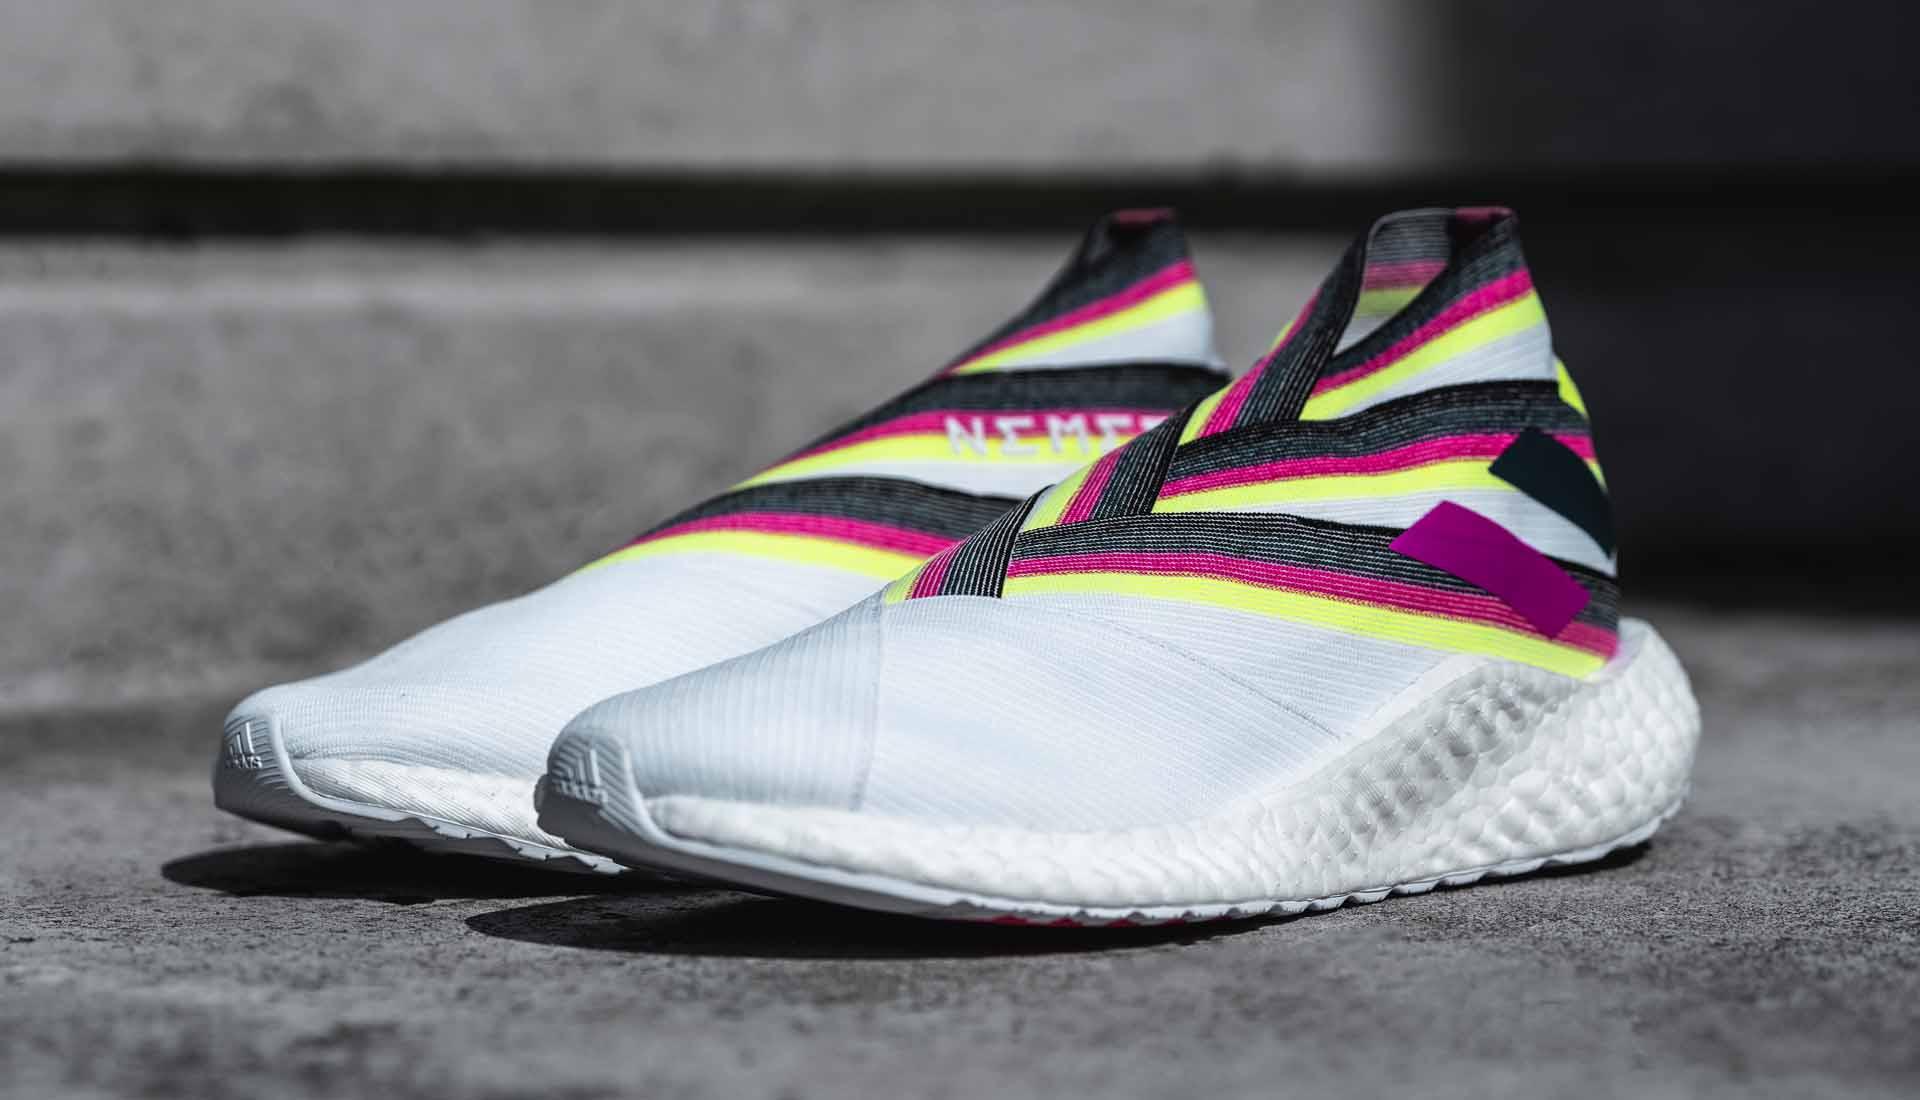 adidas Launch The Nemeziz 19+